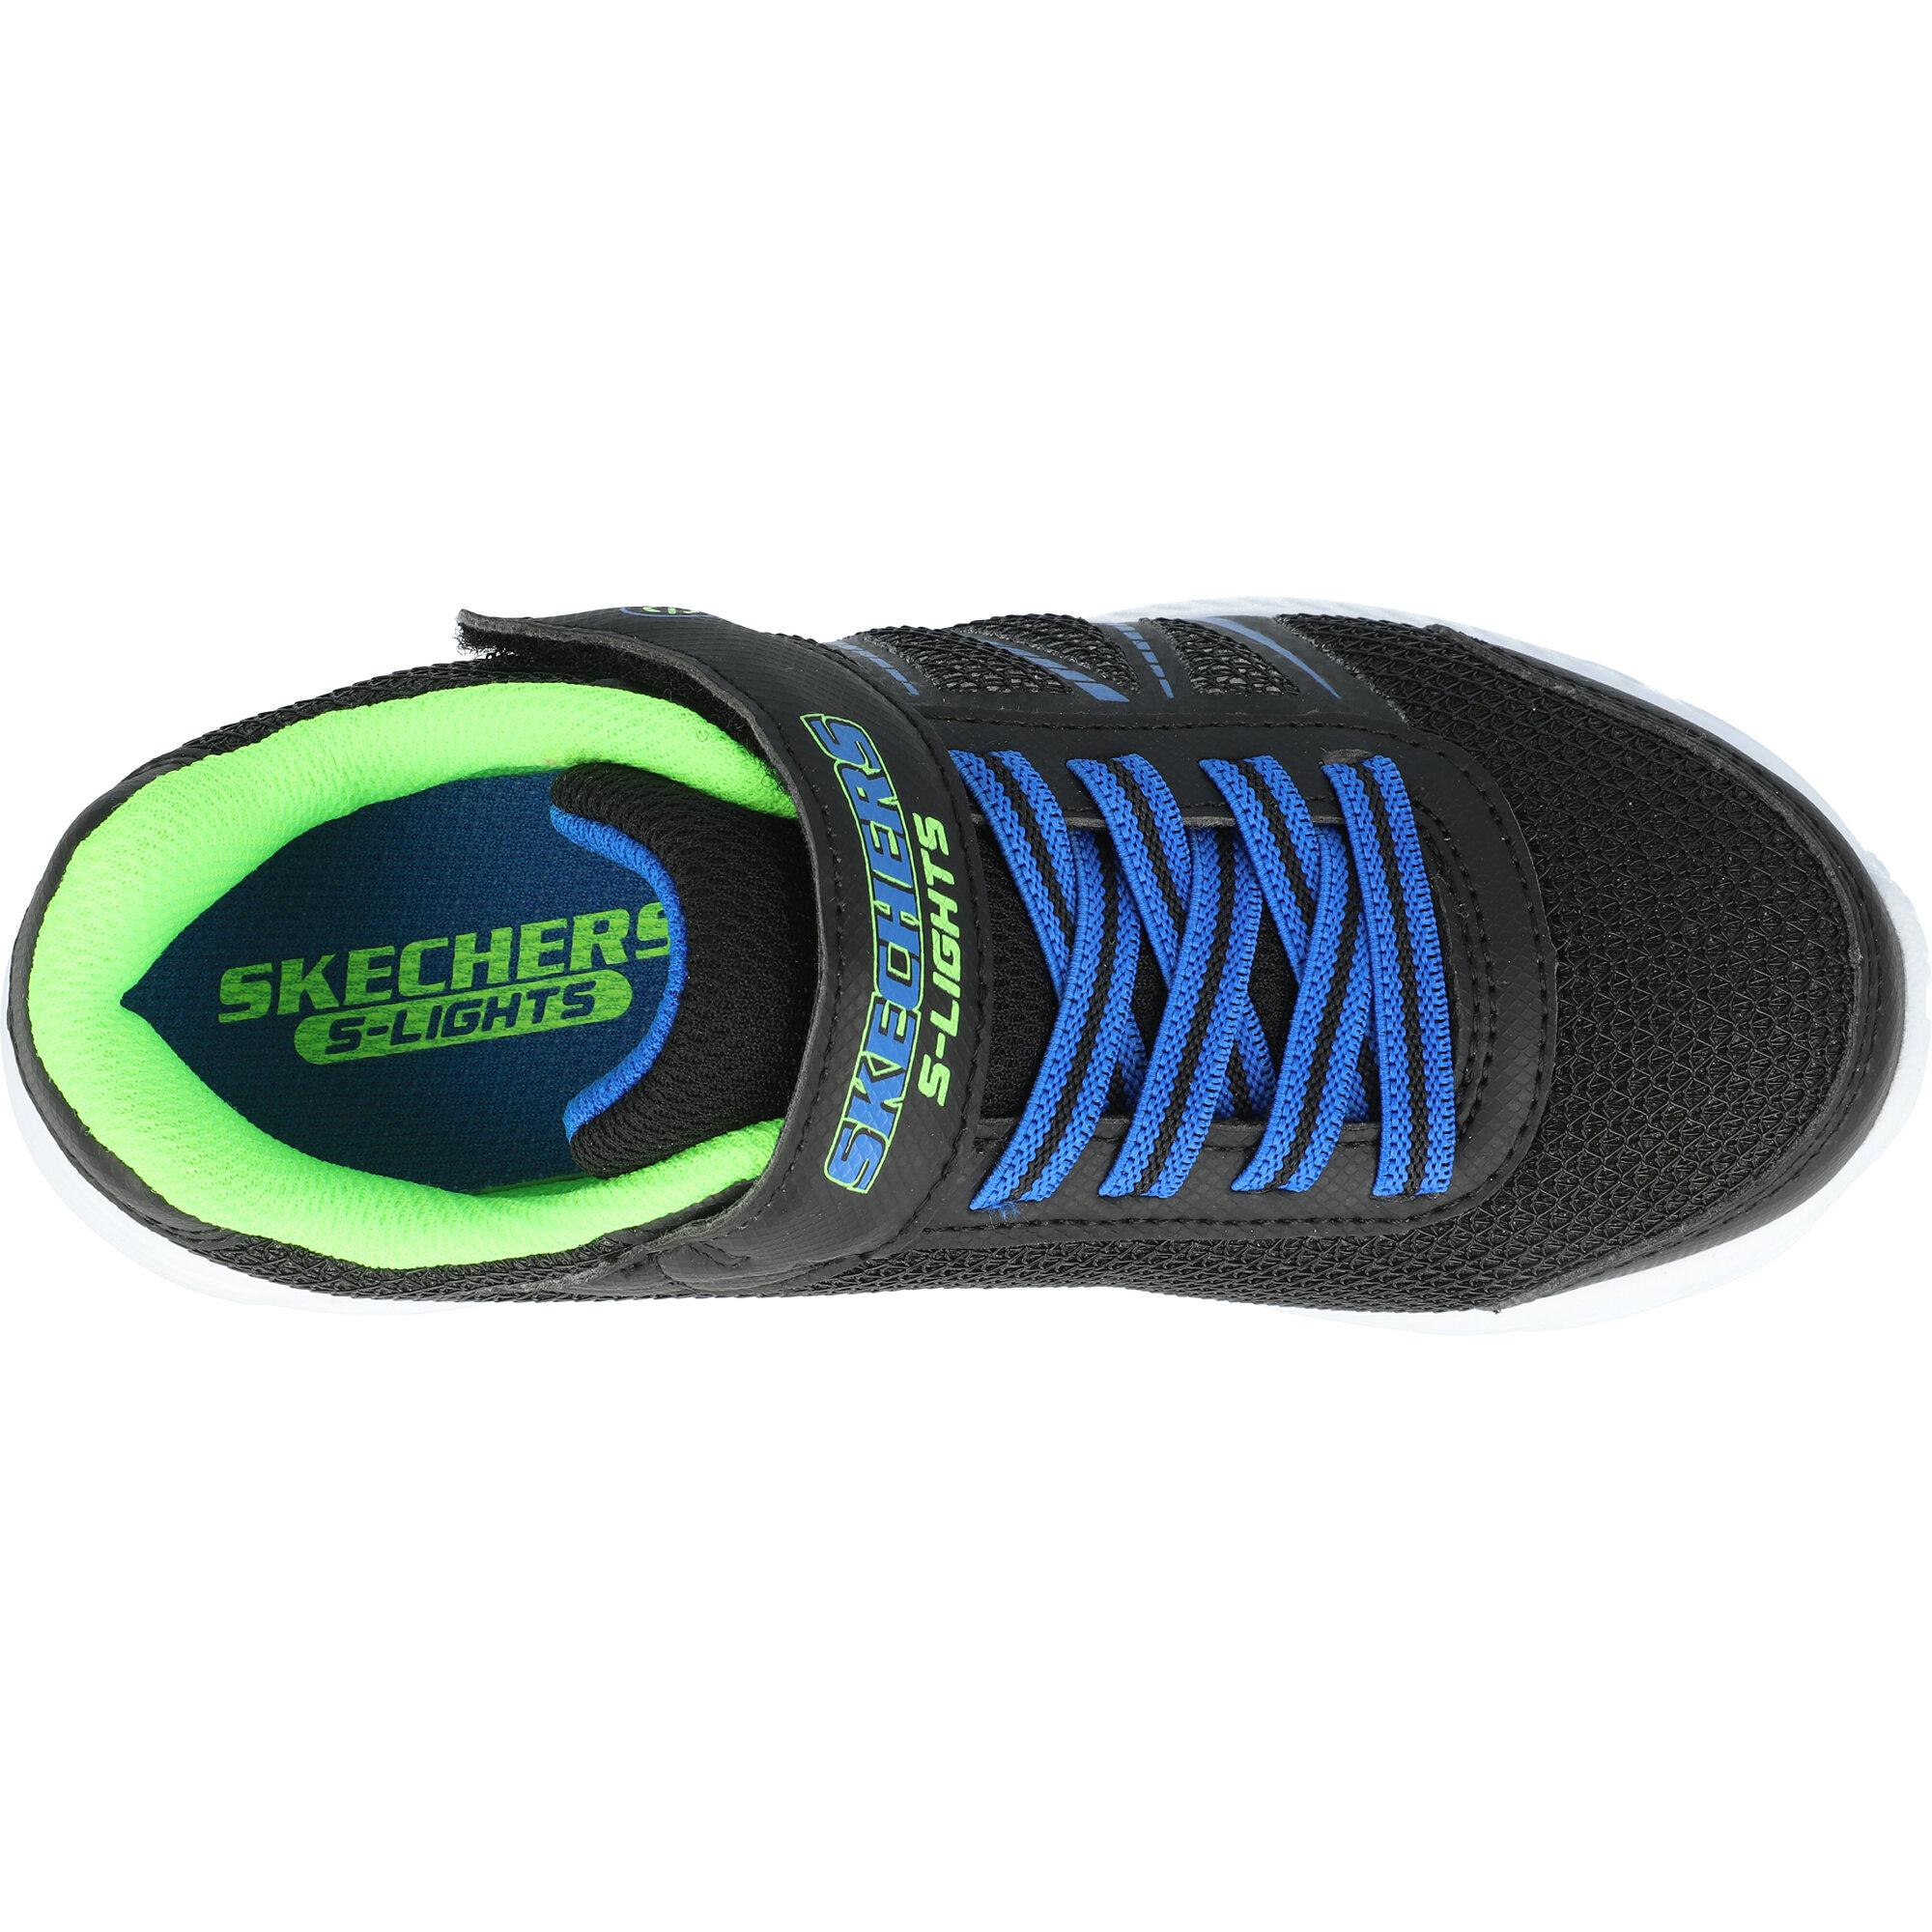 Skechers Dynamic-Flash Black/Blue Synthetic